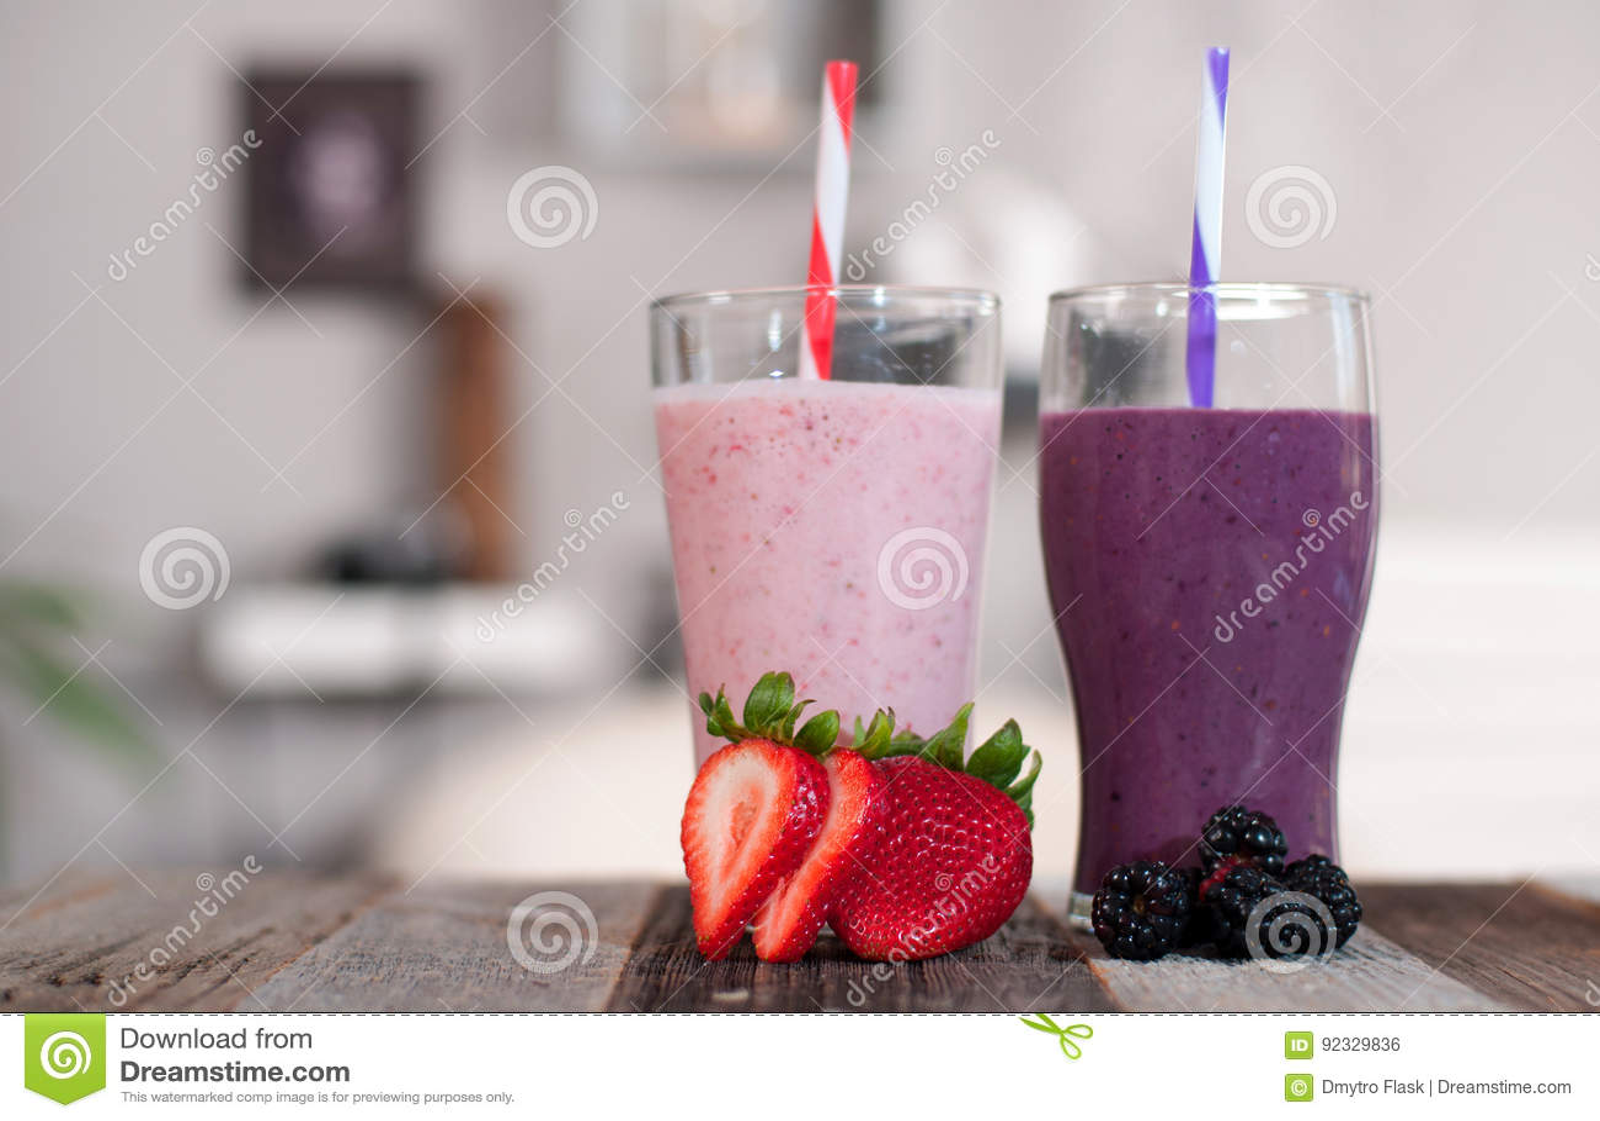 Milkshakes που γίνεται με τα φρέσκες βακκίνια και τις φράουλες σε ένα γυαλί